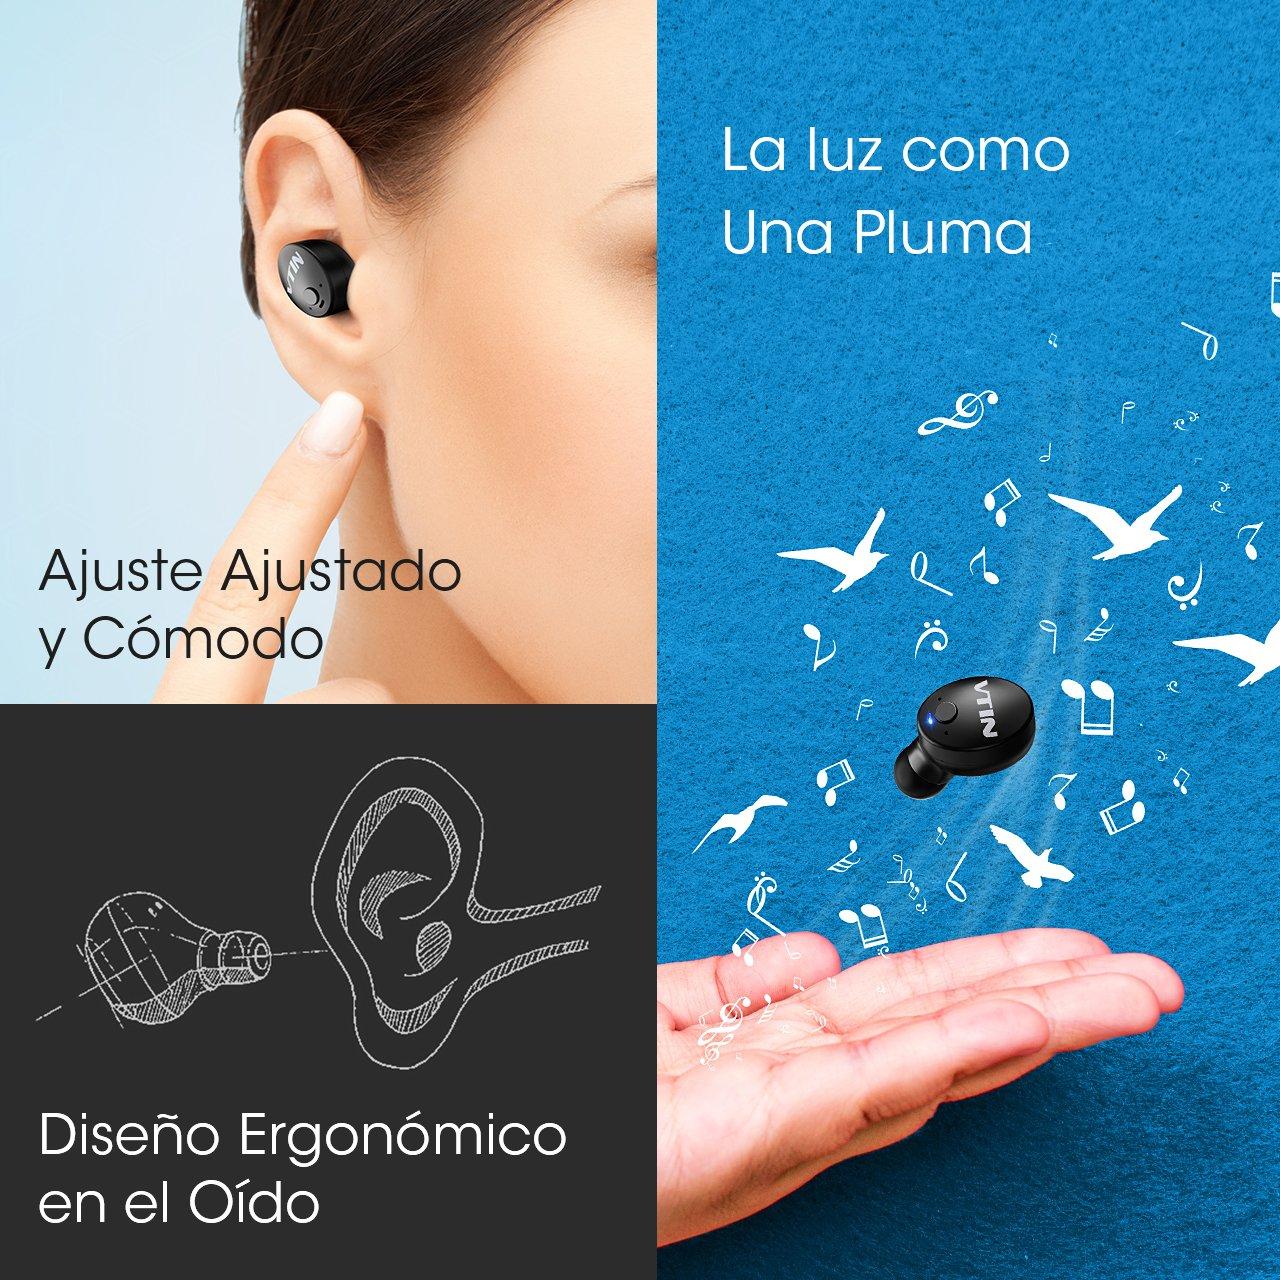 VTIN Auricular Invisible Bluetooth, VicTsing Mini Auricular Inalámbrico In Ear con Micrófono, Dos USB Cargardores y UNA Caja Portátil. para Hacer Llamadas ...